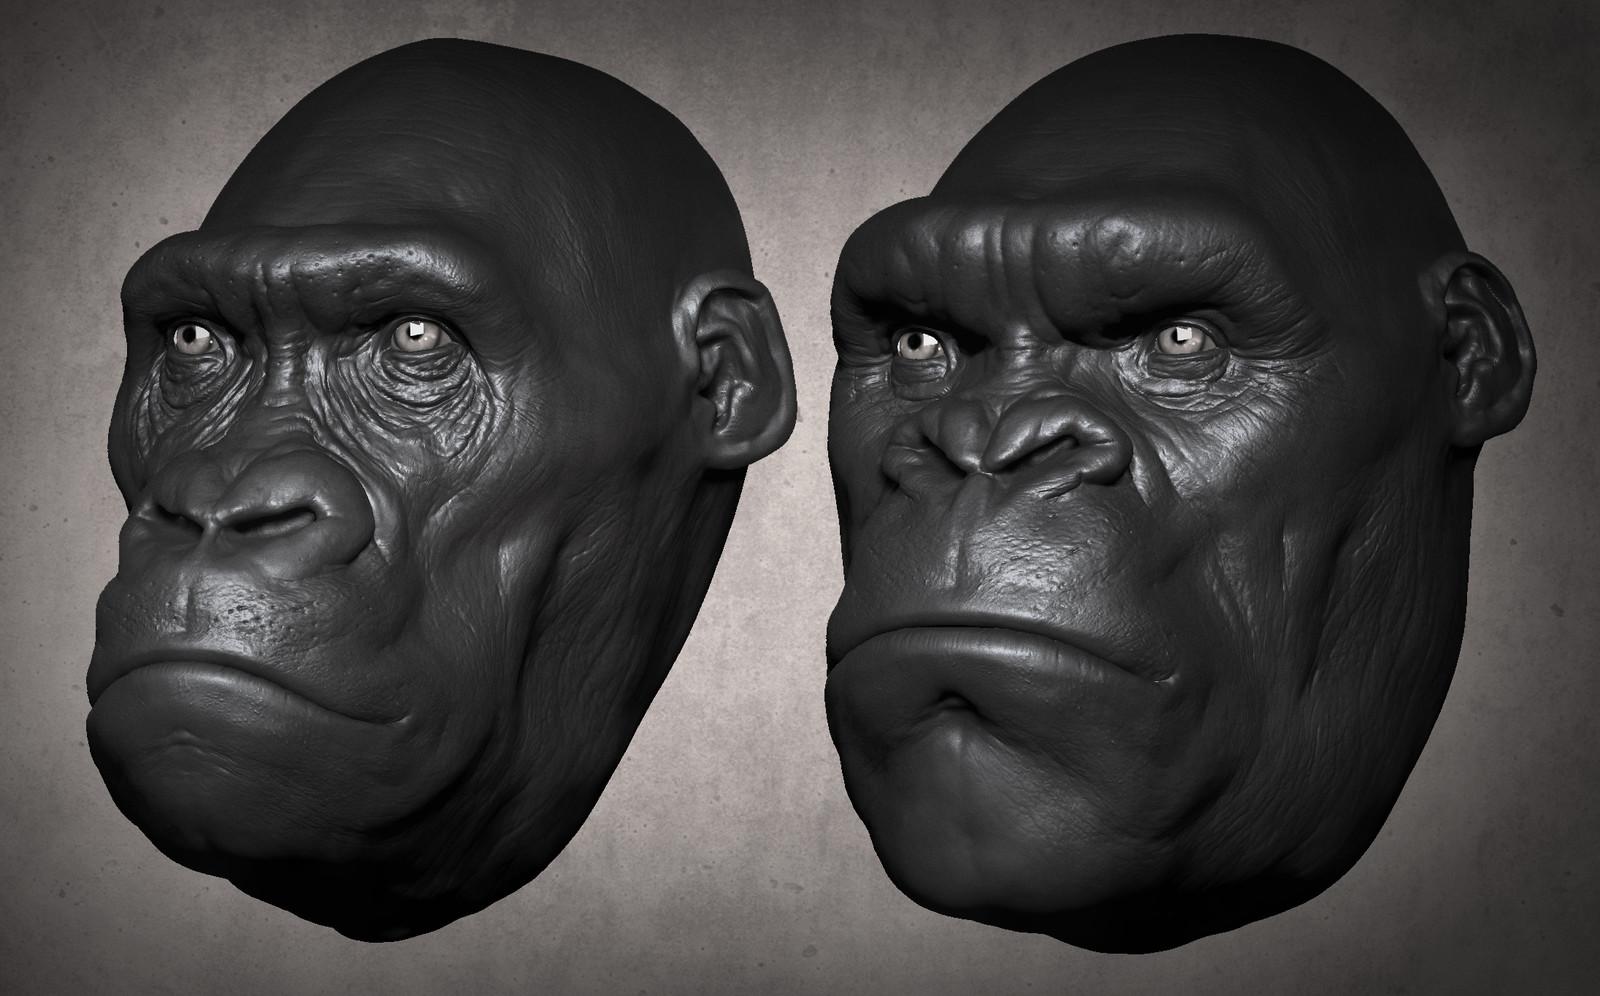 Gorilla vs Kong